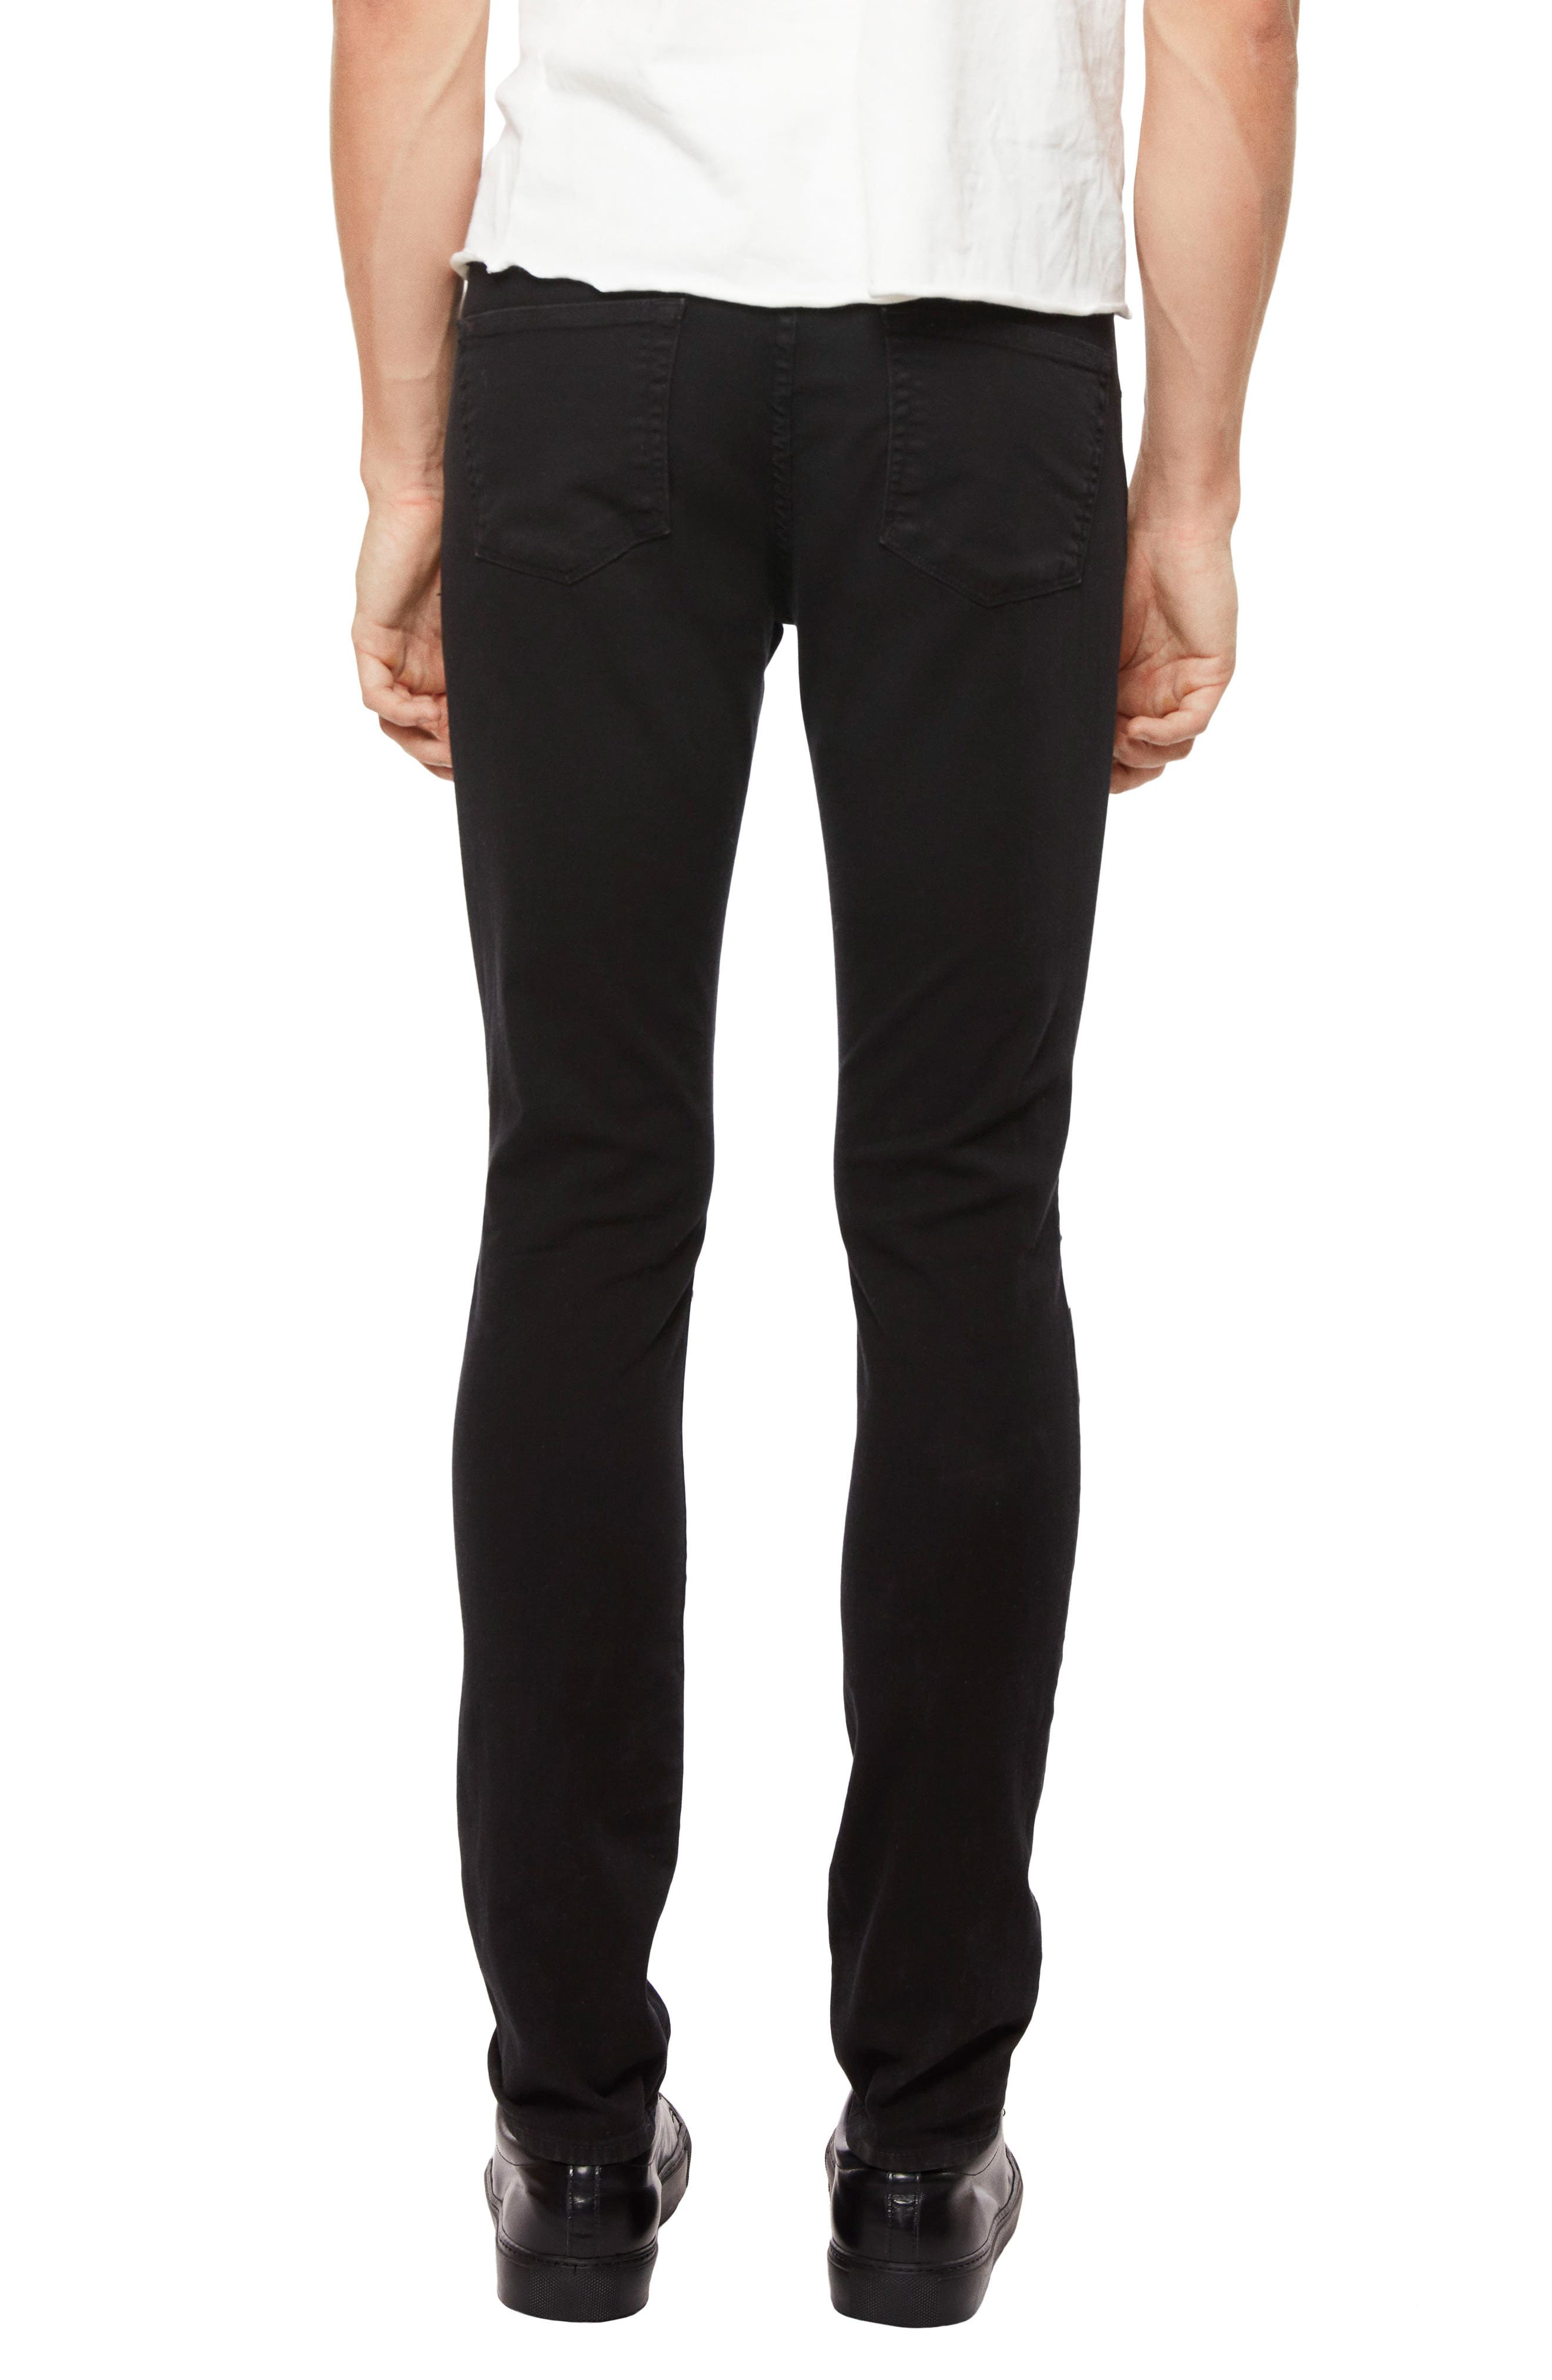 Mick Skinny Fit Jeans,                             Alternate thumbnail 2, color,                             001